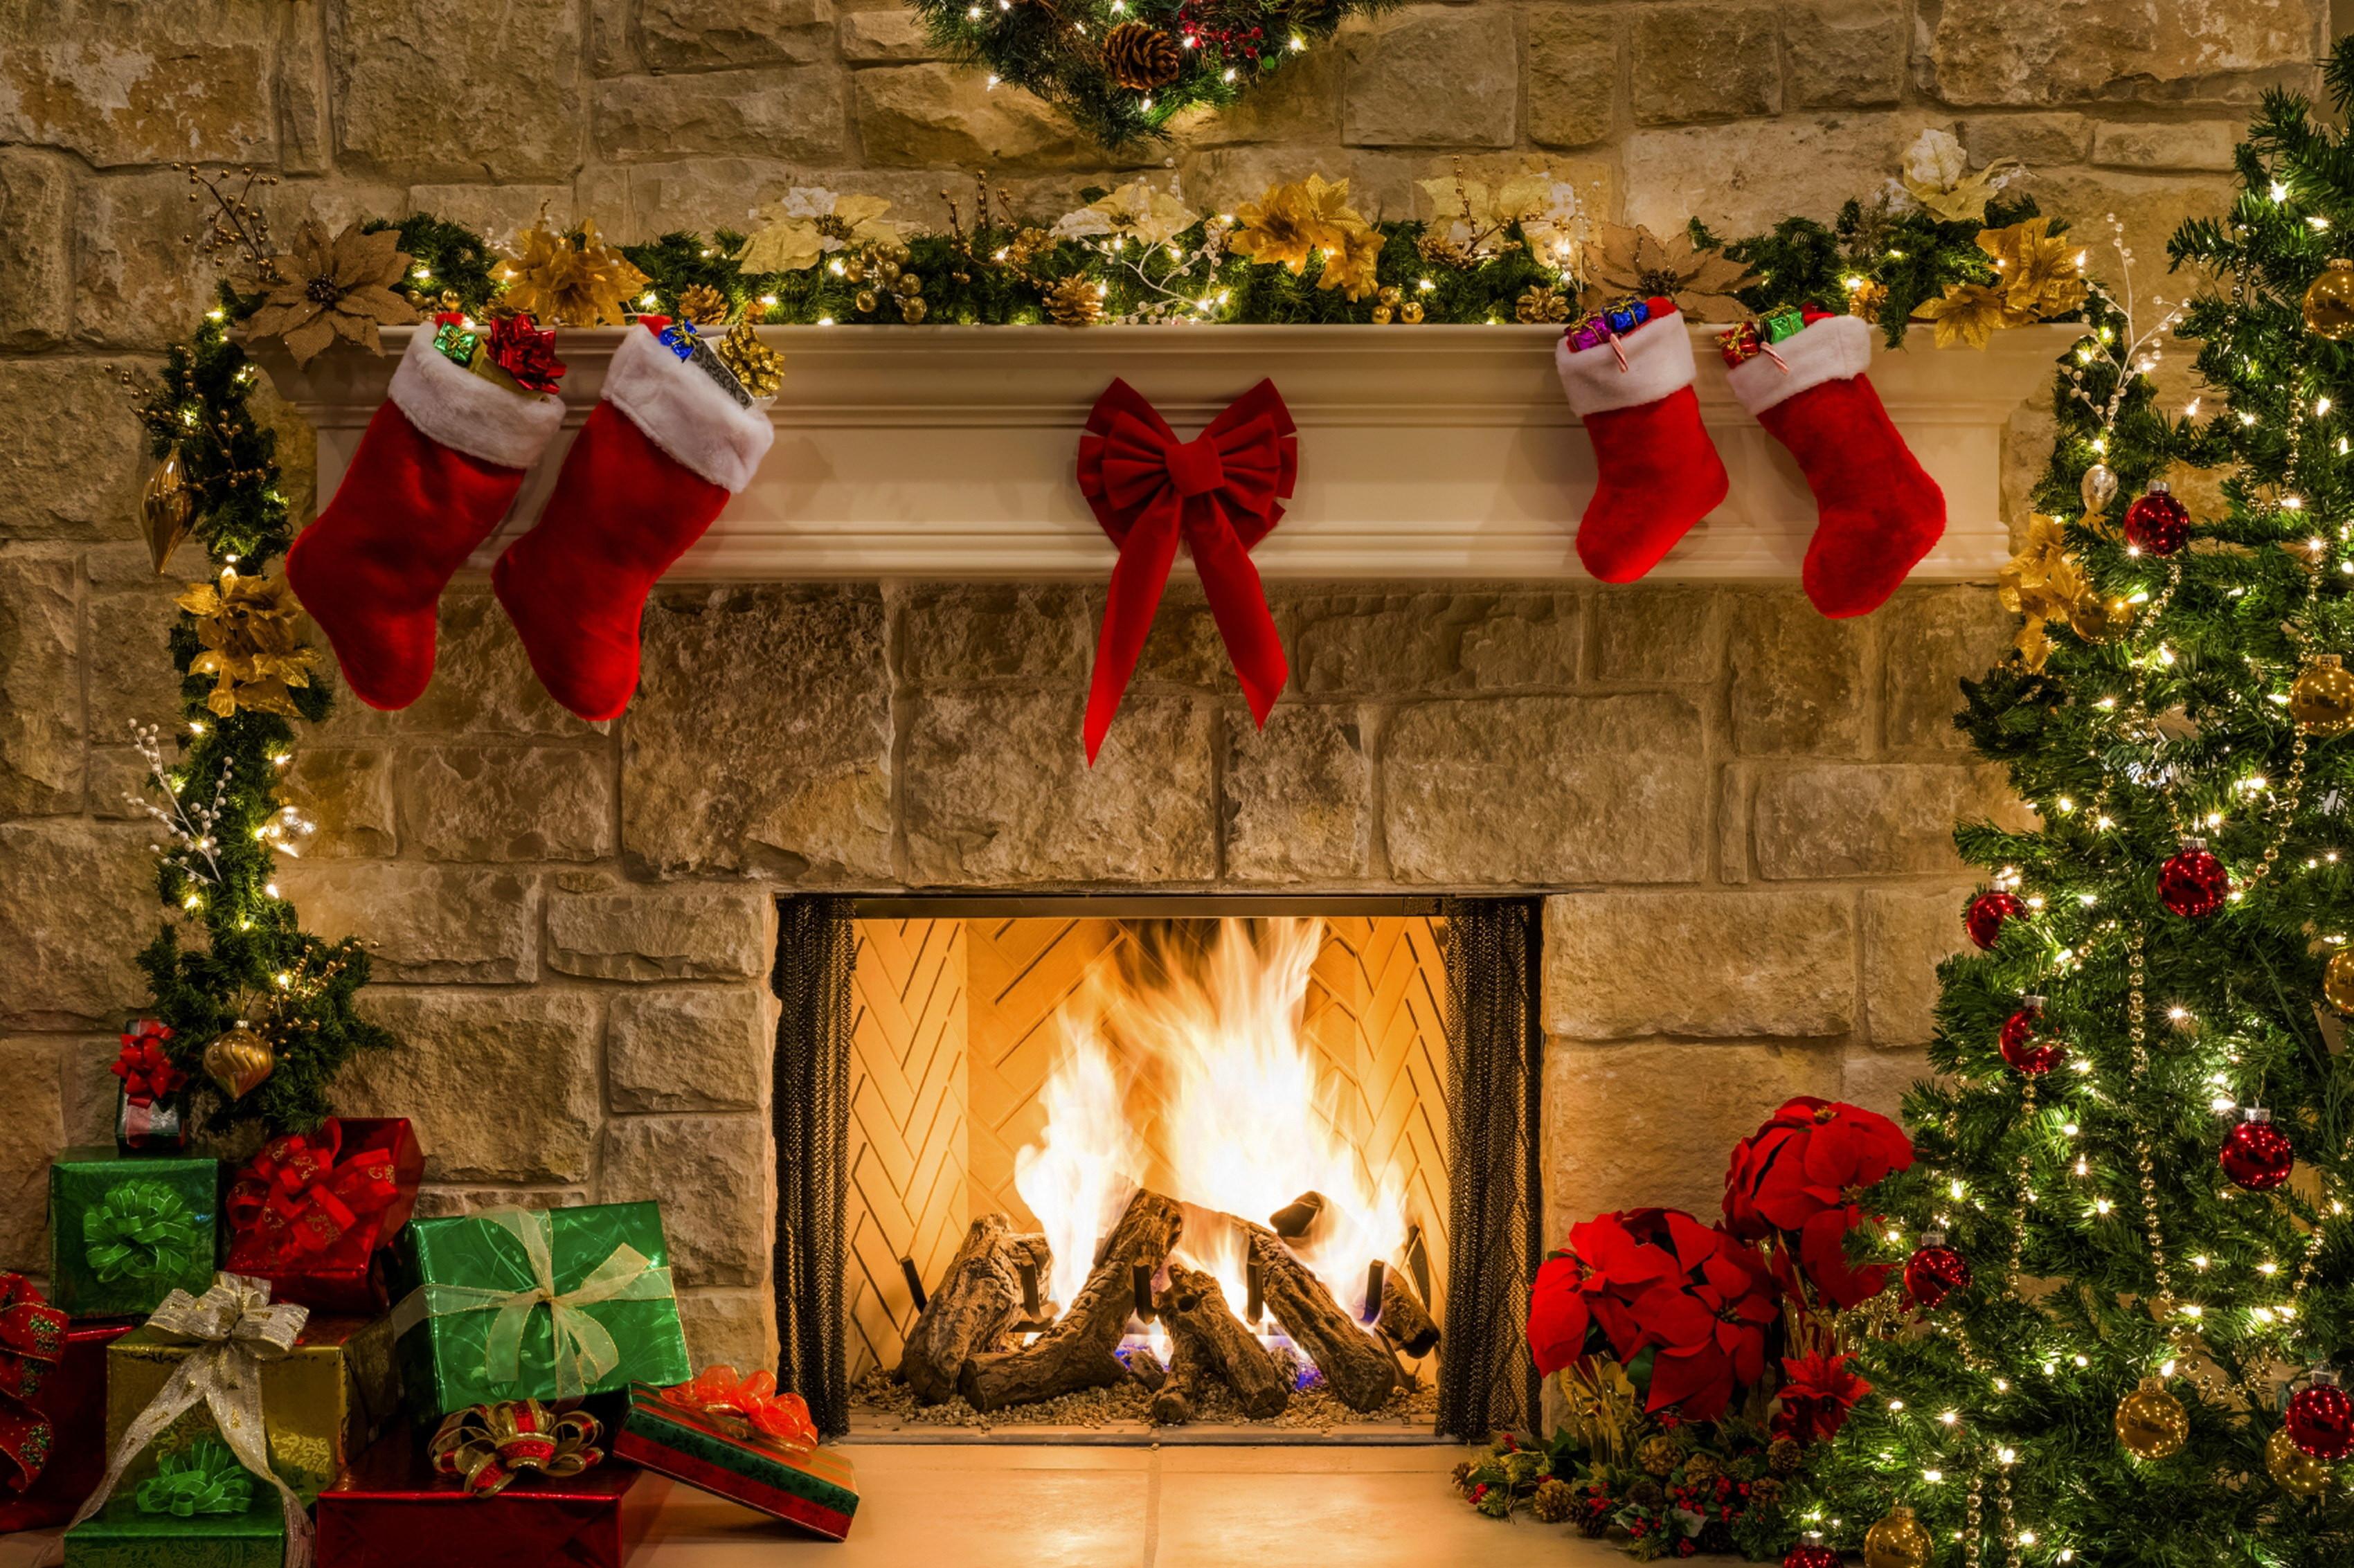 Christmas Themed Fireplace Screen  Fireplace & Knit Christmas Stockings